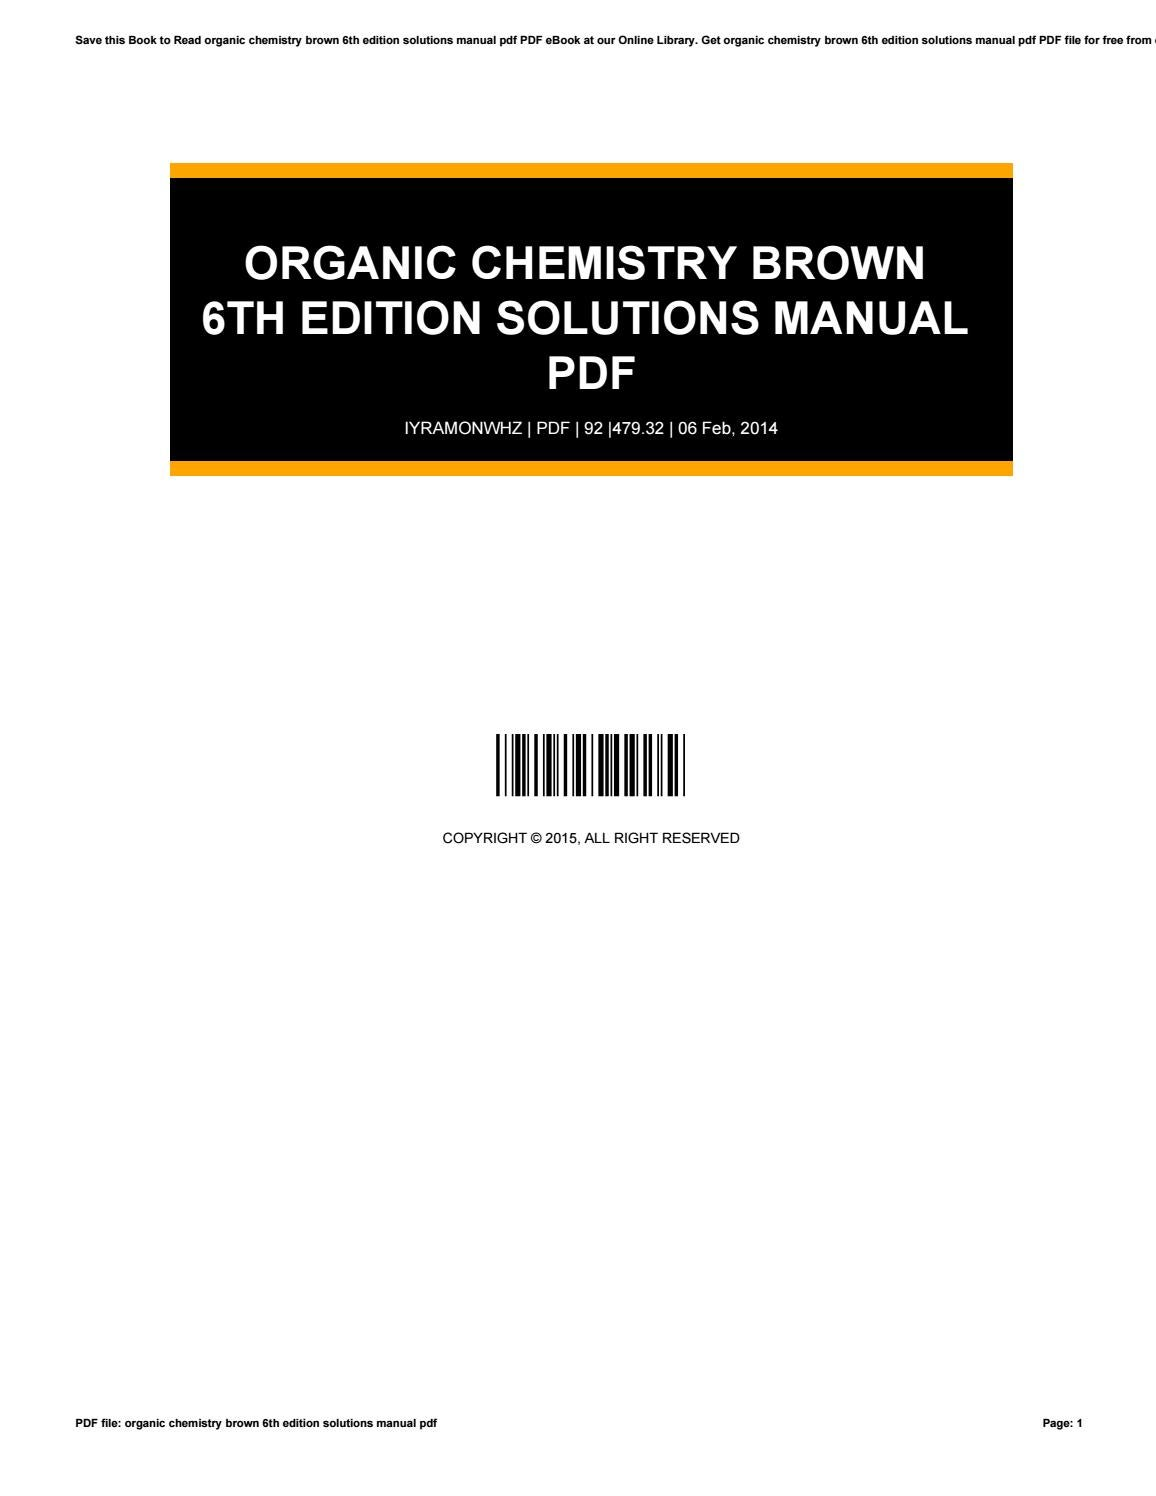 Organic chemistry brown 6th edition solutions manual pdf by bilbina87usyma  - issuu